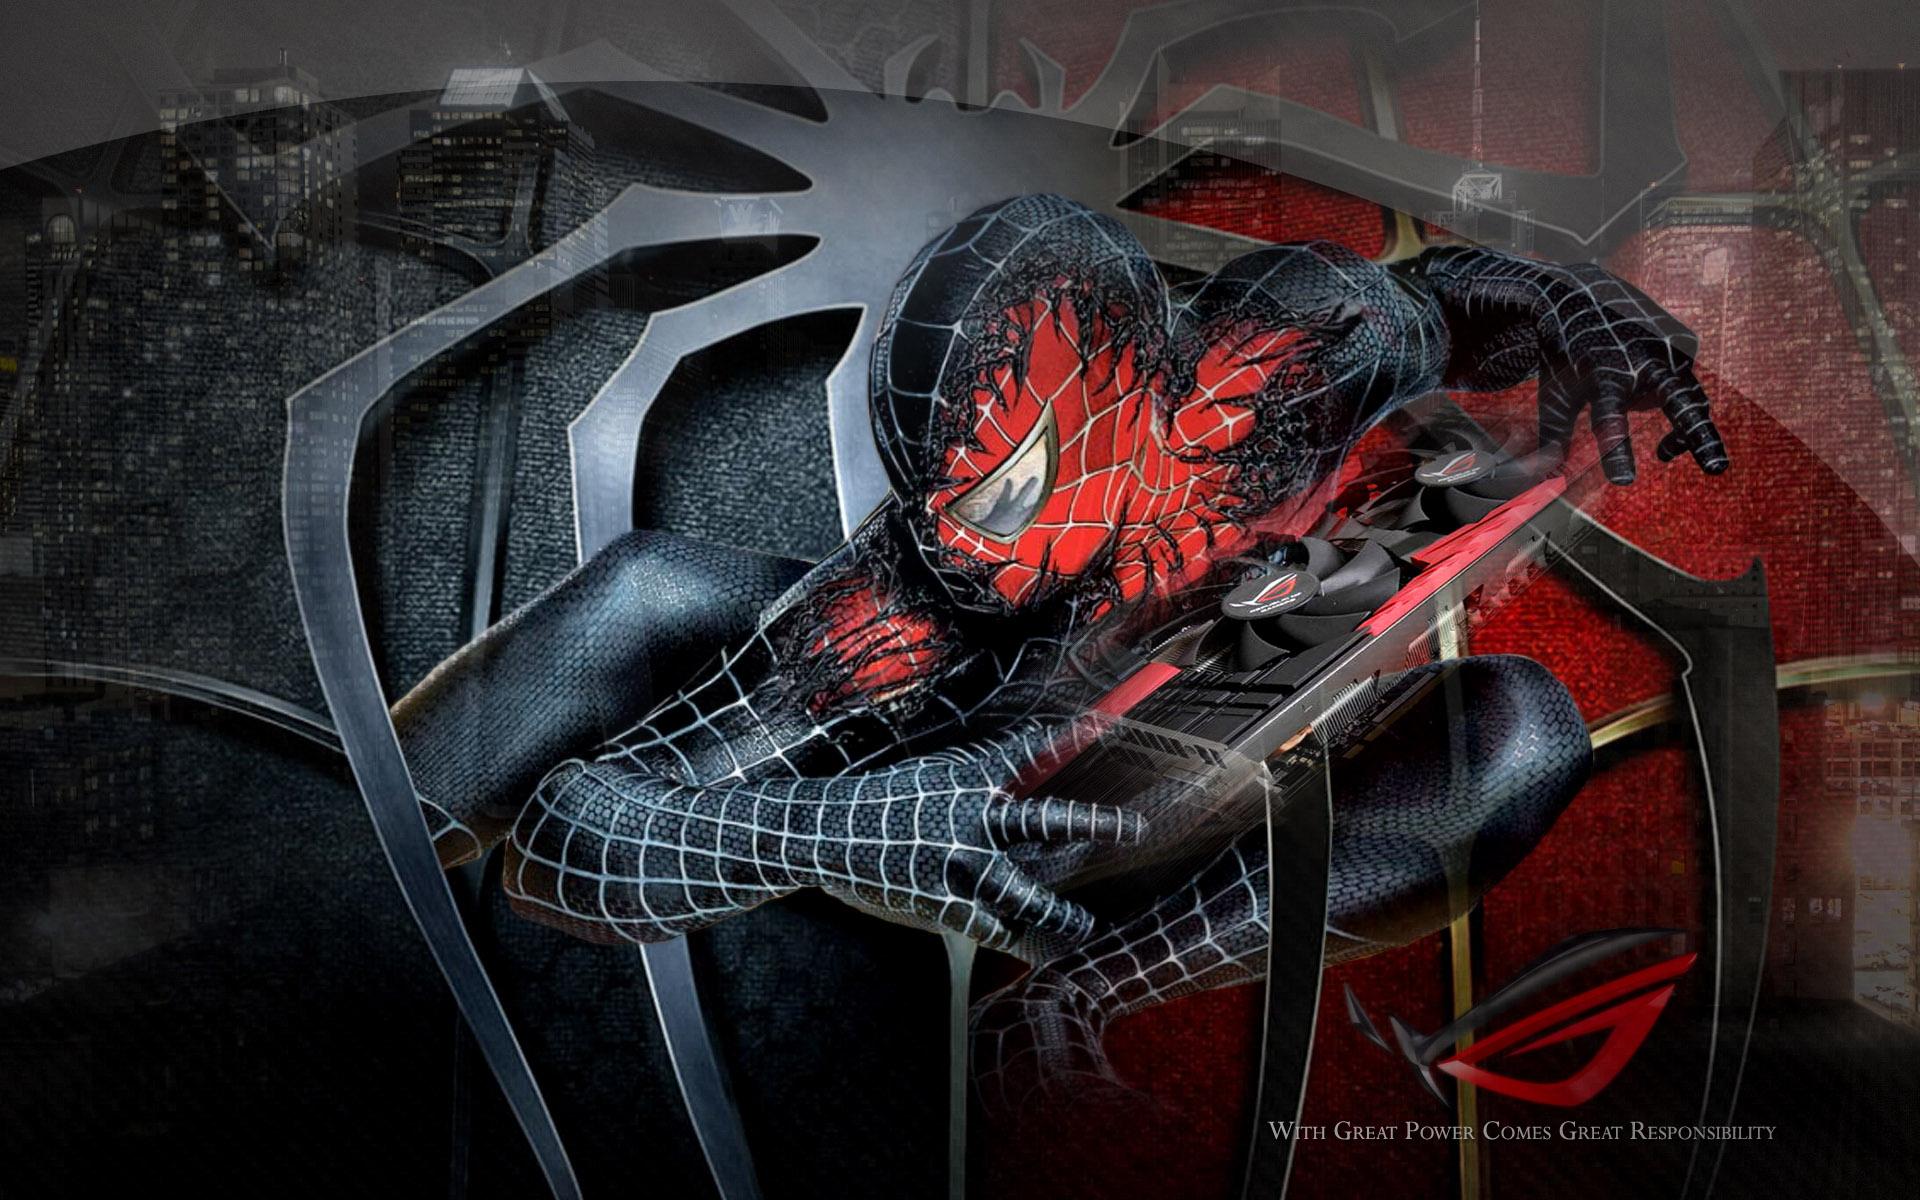 Download Spiderman Wallpaper For Iphone Ipad